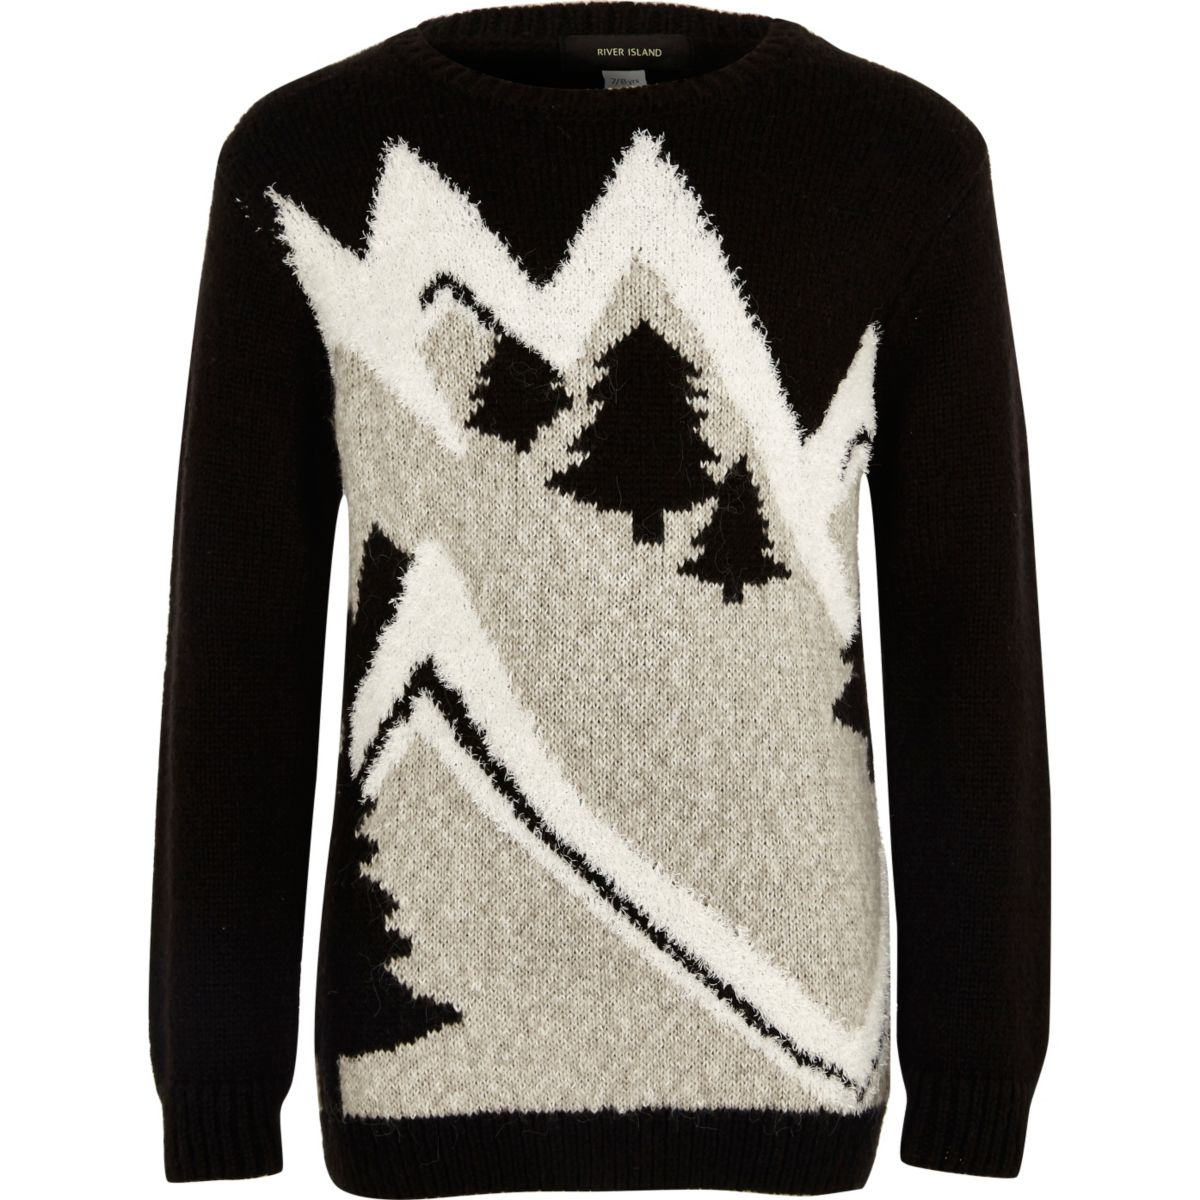 Boys black novelty ski slope Christmas sweater